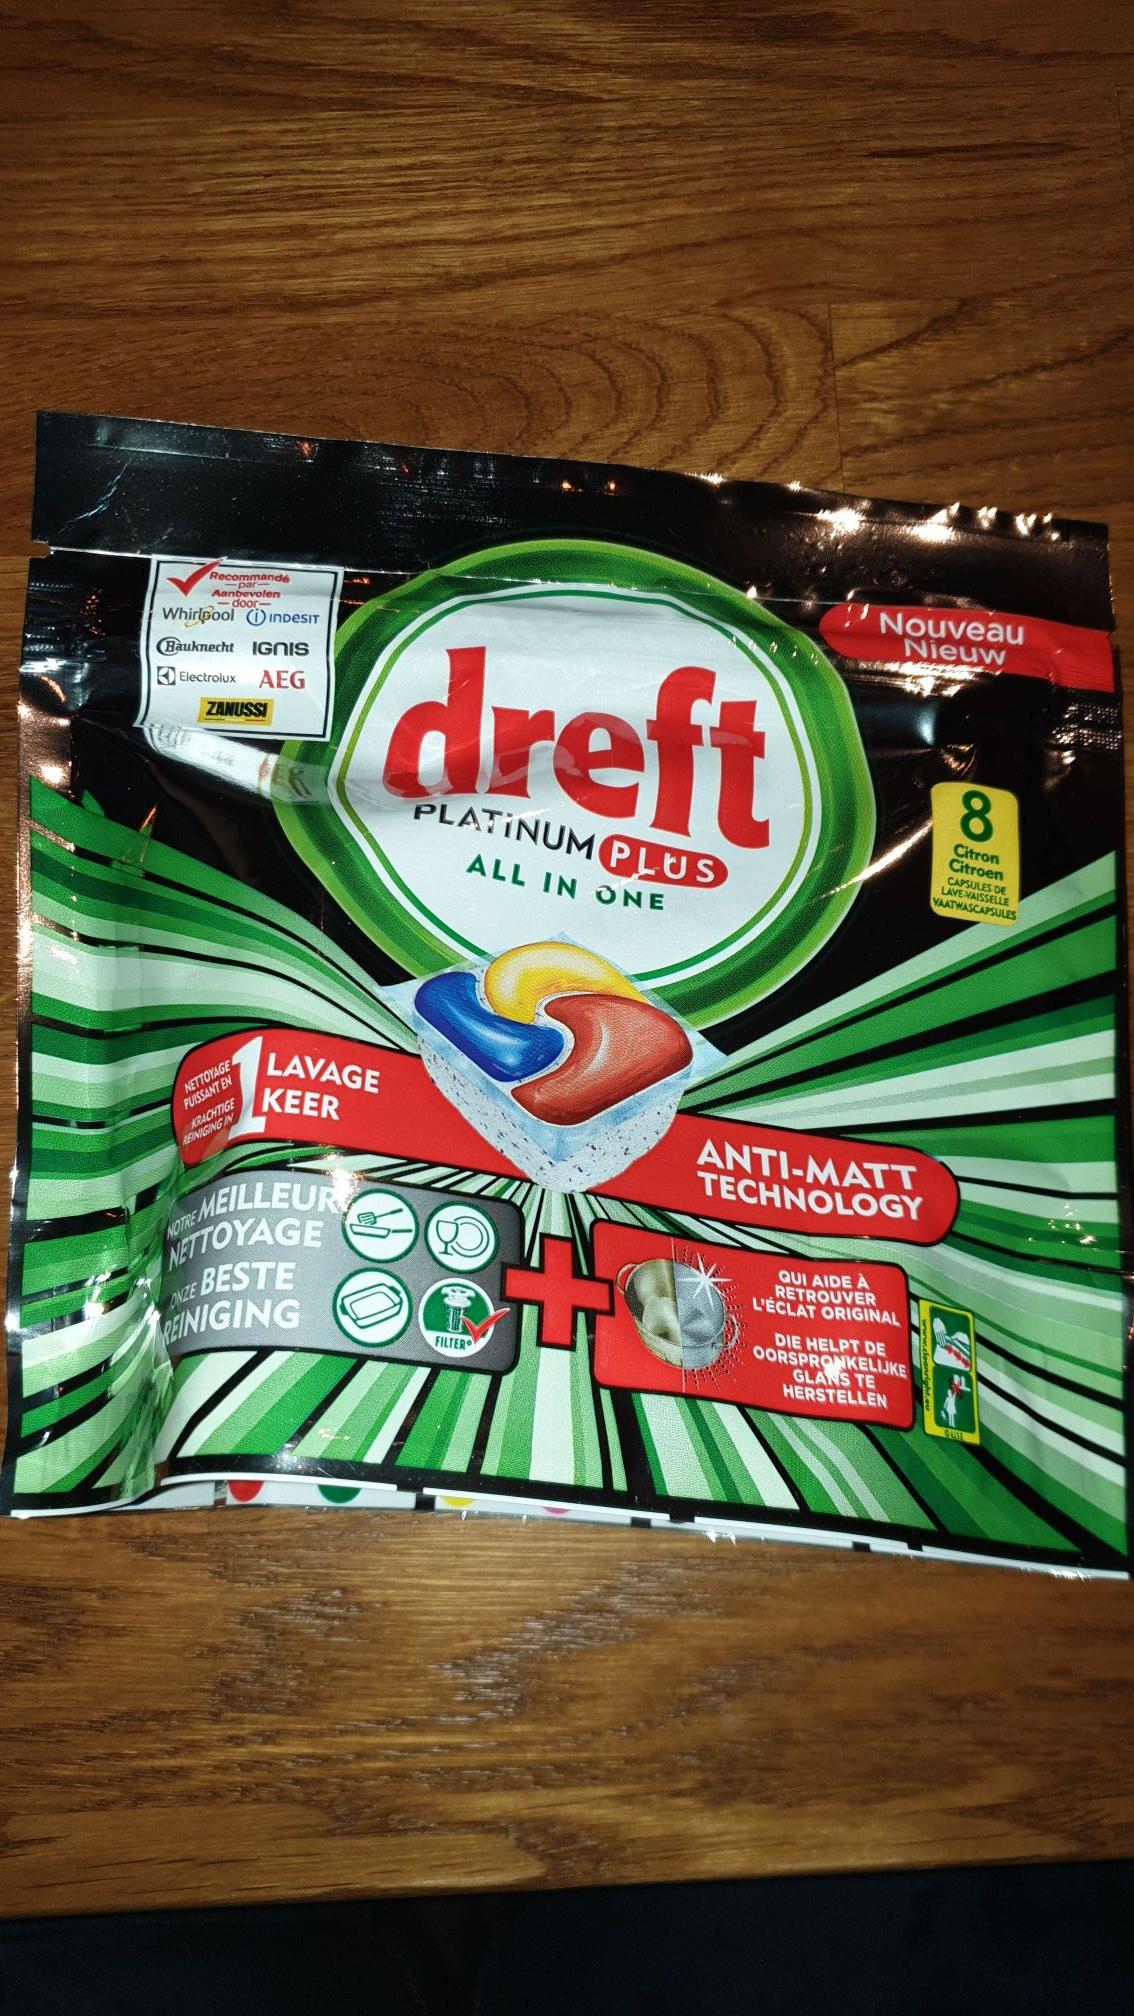 Kruidvat: Dreft platinum plus all in one : inhoud 8 stuks voor maar 1 euro